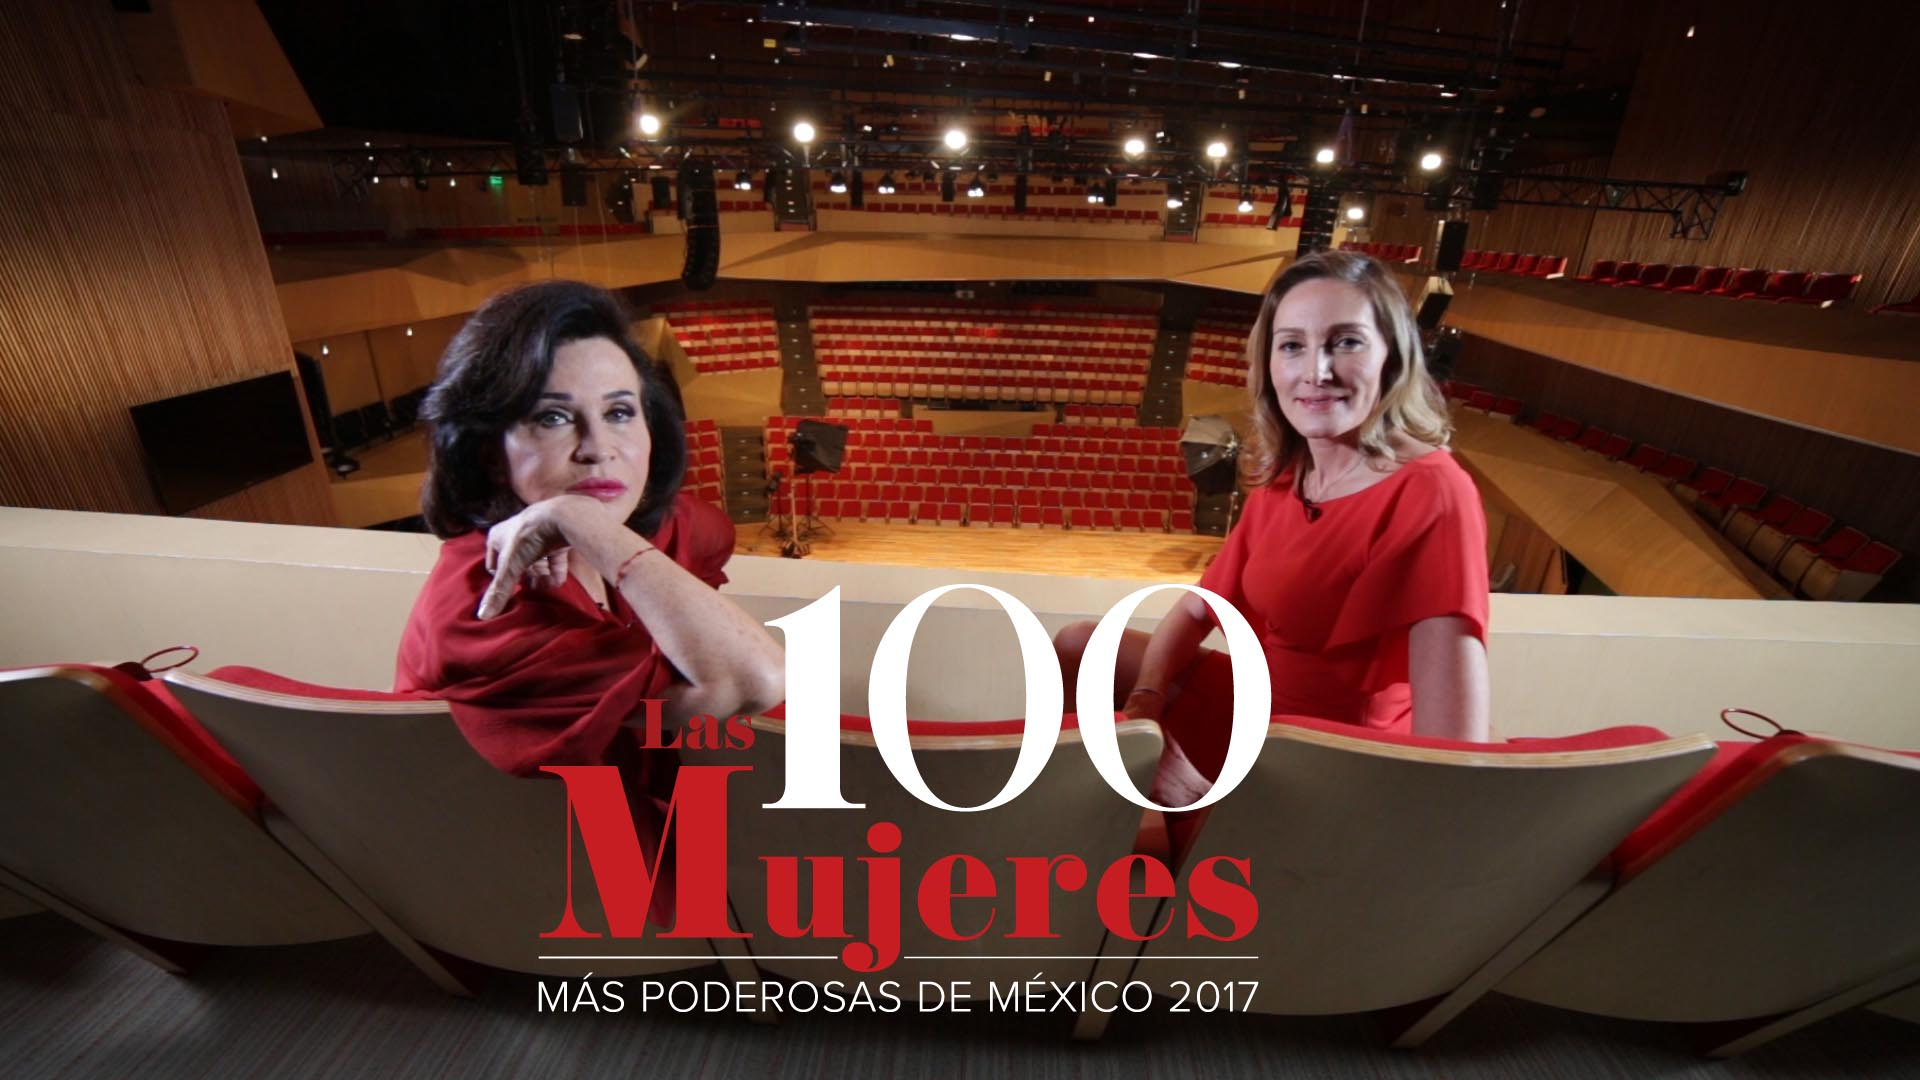 Mujeres Poderosas Forbes 2017. Pepita Serrano y Alejandra Alemán